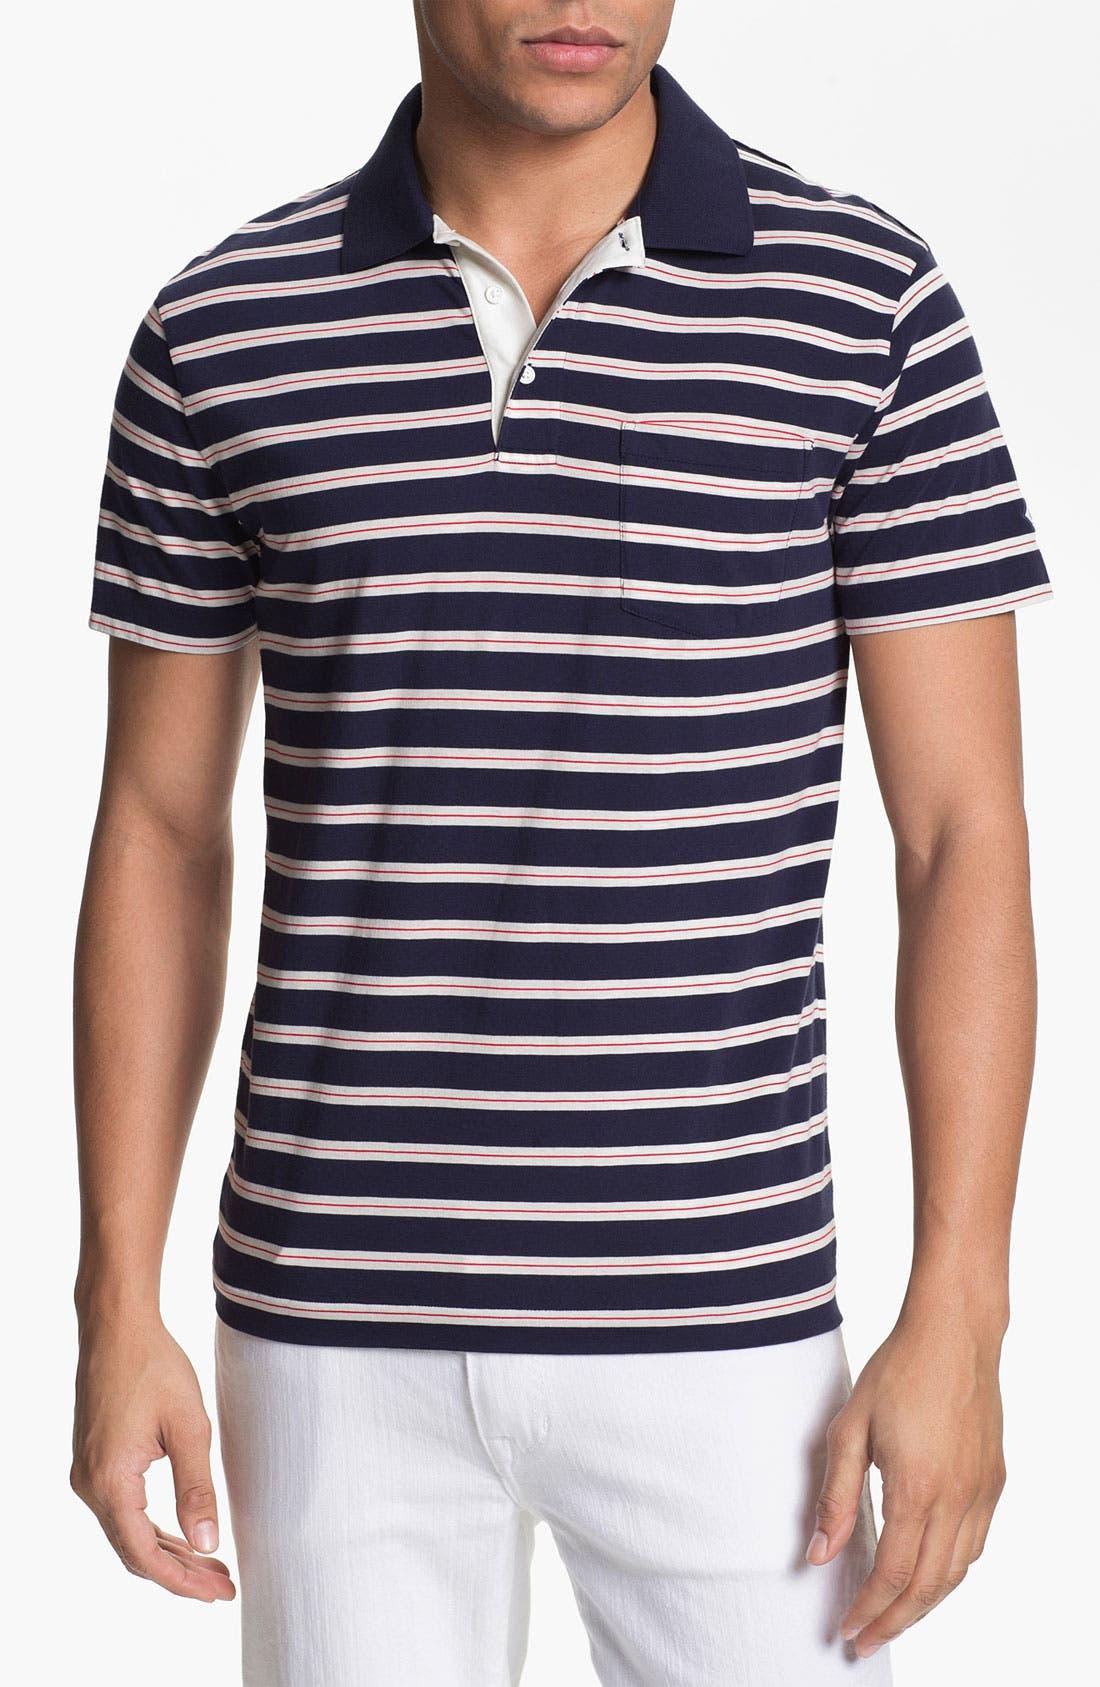 Alternate Image 1 Selected - Gant Rugger Stripe Jersey Polo